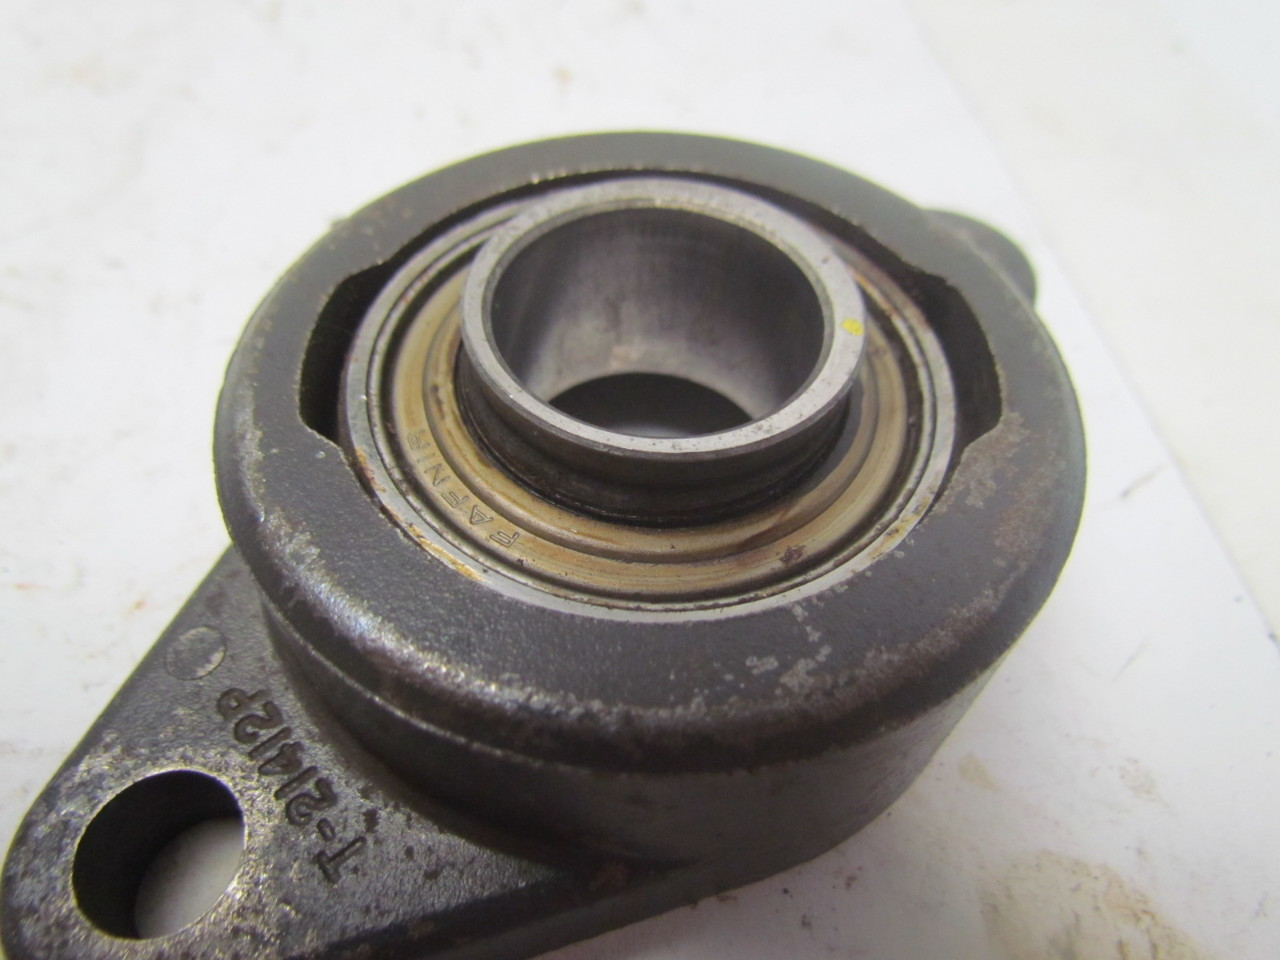 Fafnir vcjt1 2 bolt flanged bearing housing 1 7 16 id lot for House bearing